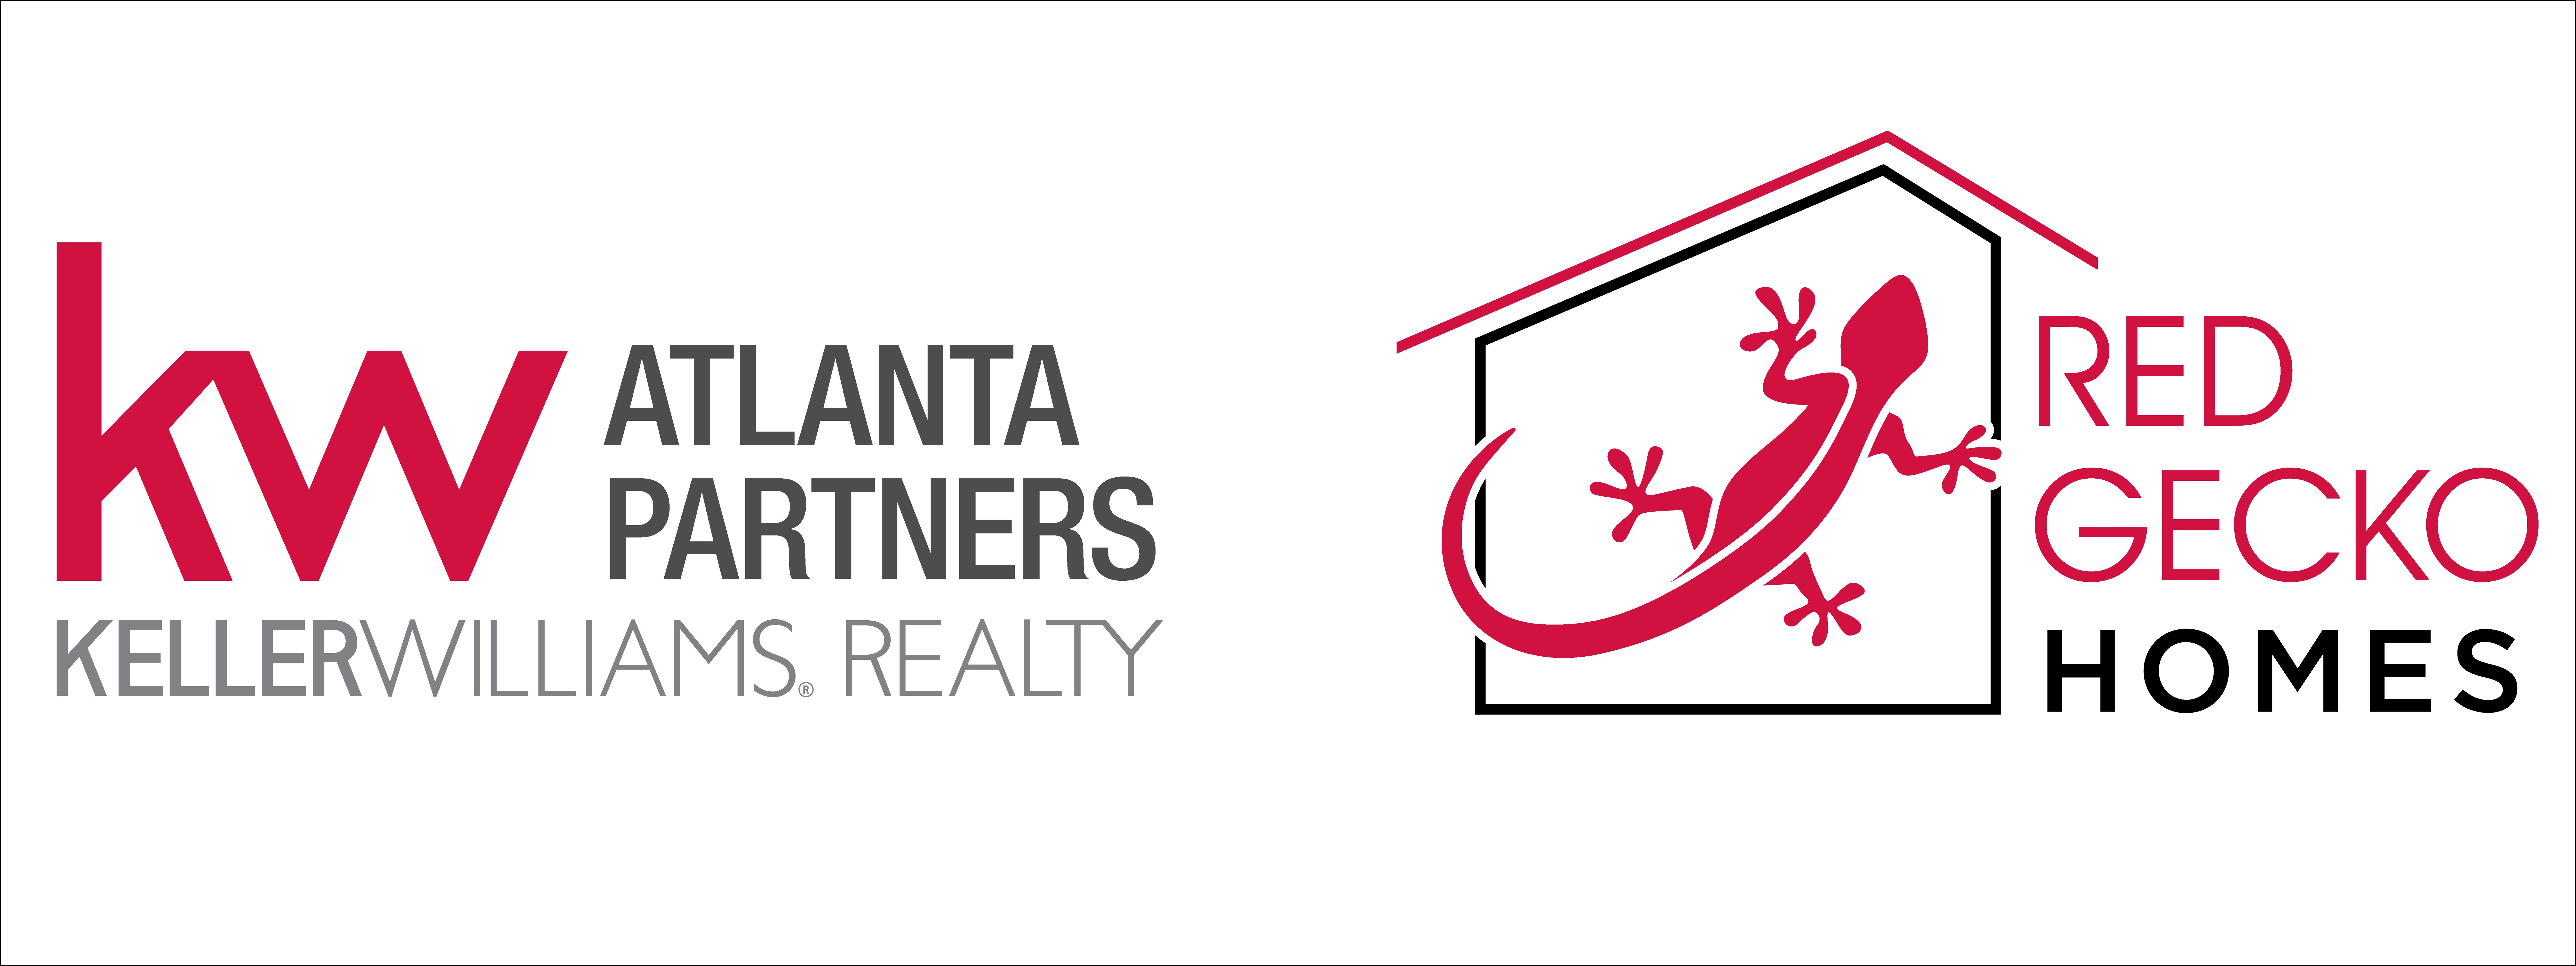 Red Gecko Homes @ Keller Williams Realty Atlanta Partners Logo